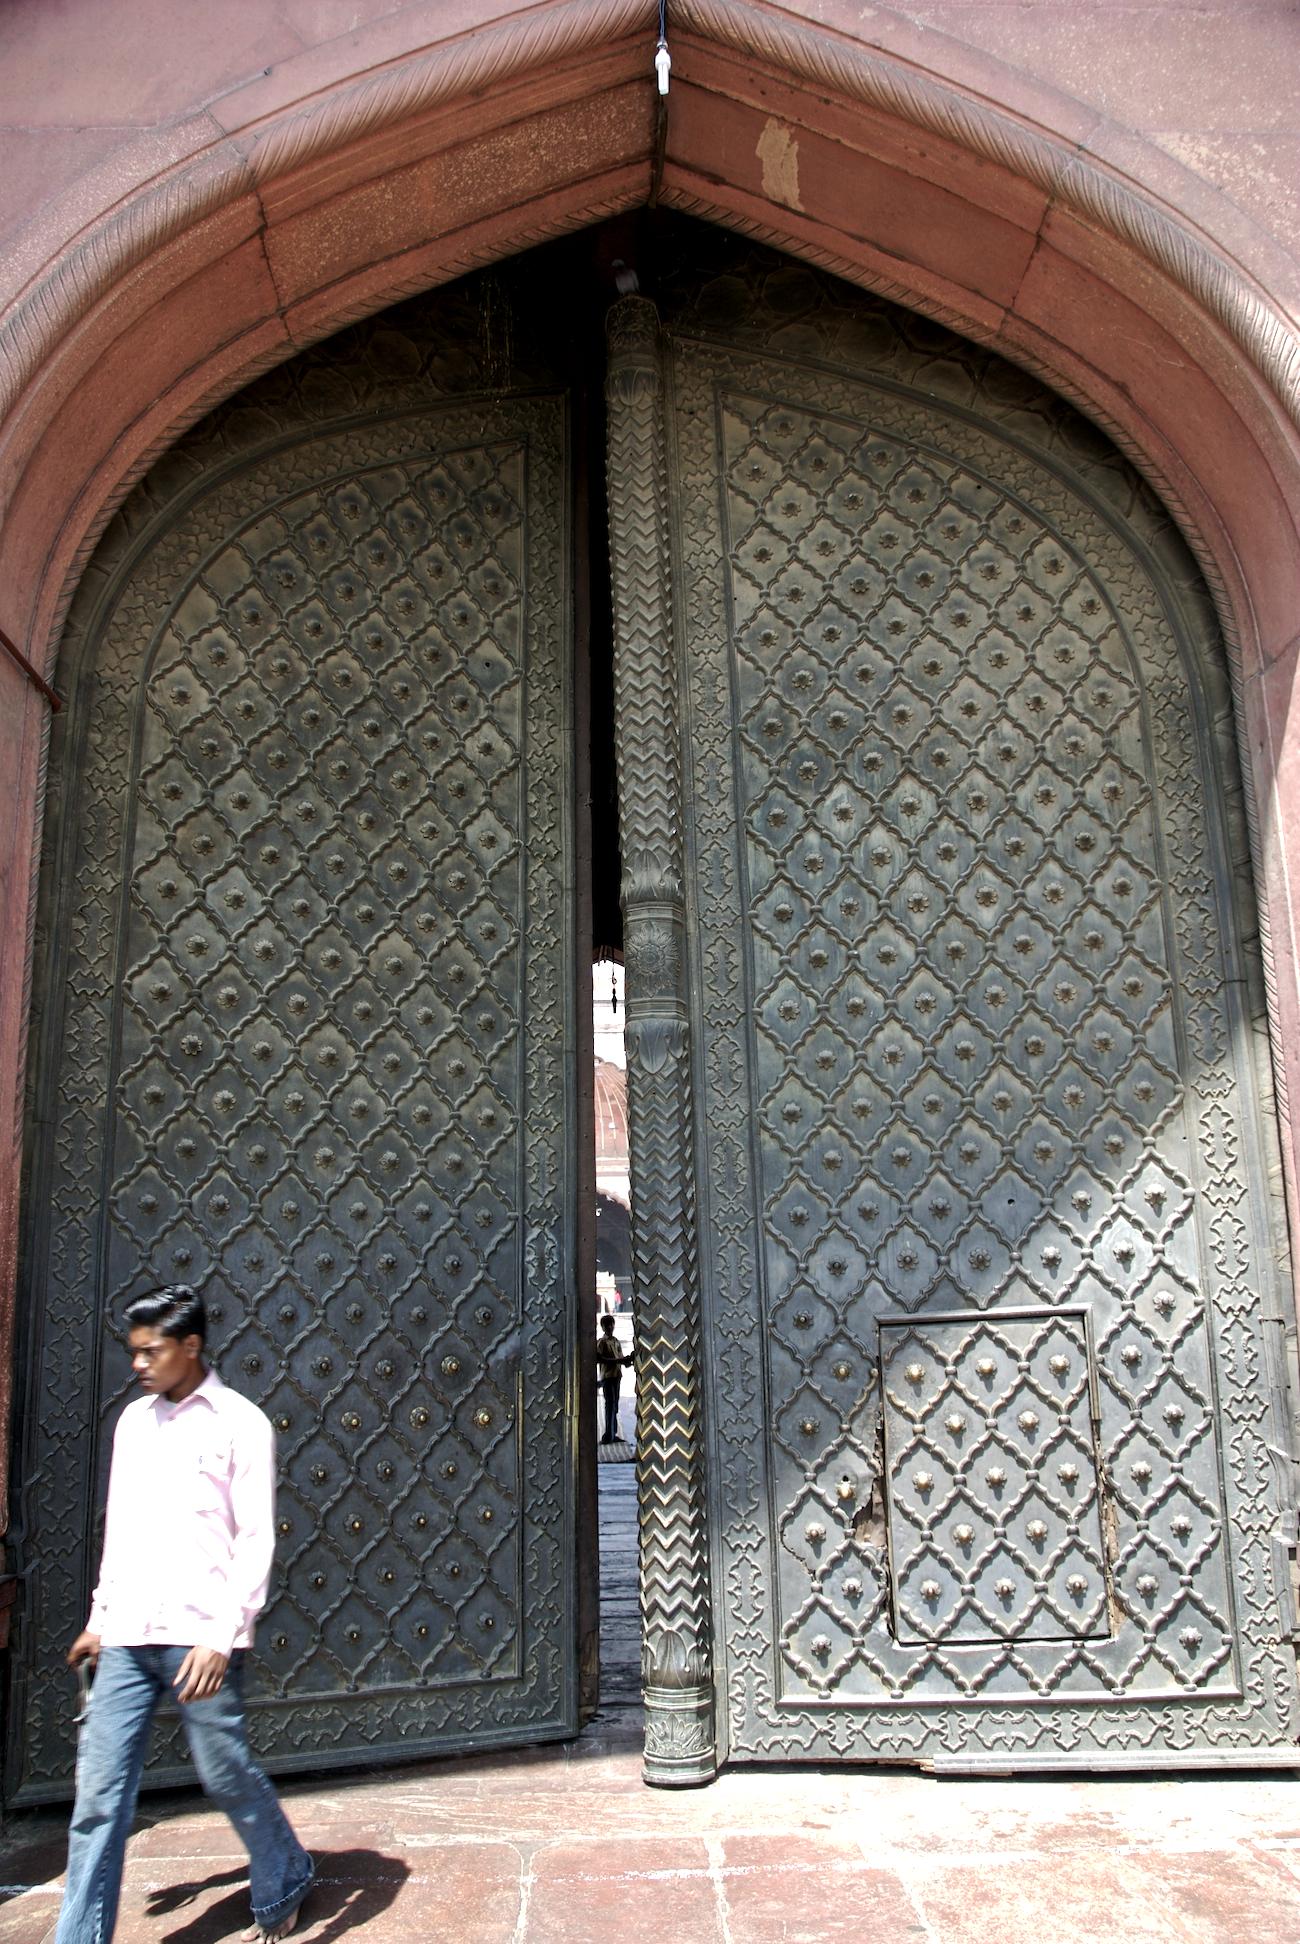 FileIron door of the main entrance Jama Masjid Delhi.jpg & File:Iron door of the main entrance Jama Masjid Delhi.jpg ...